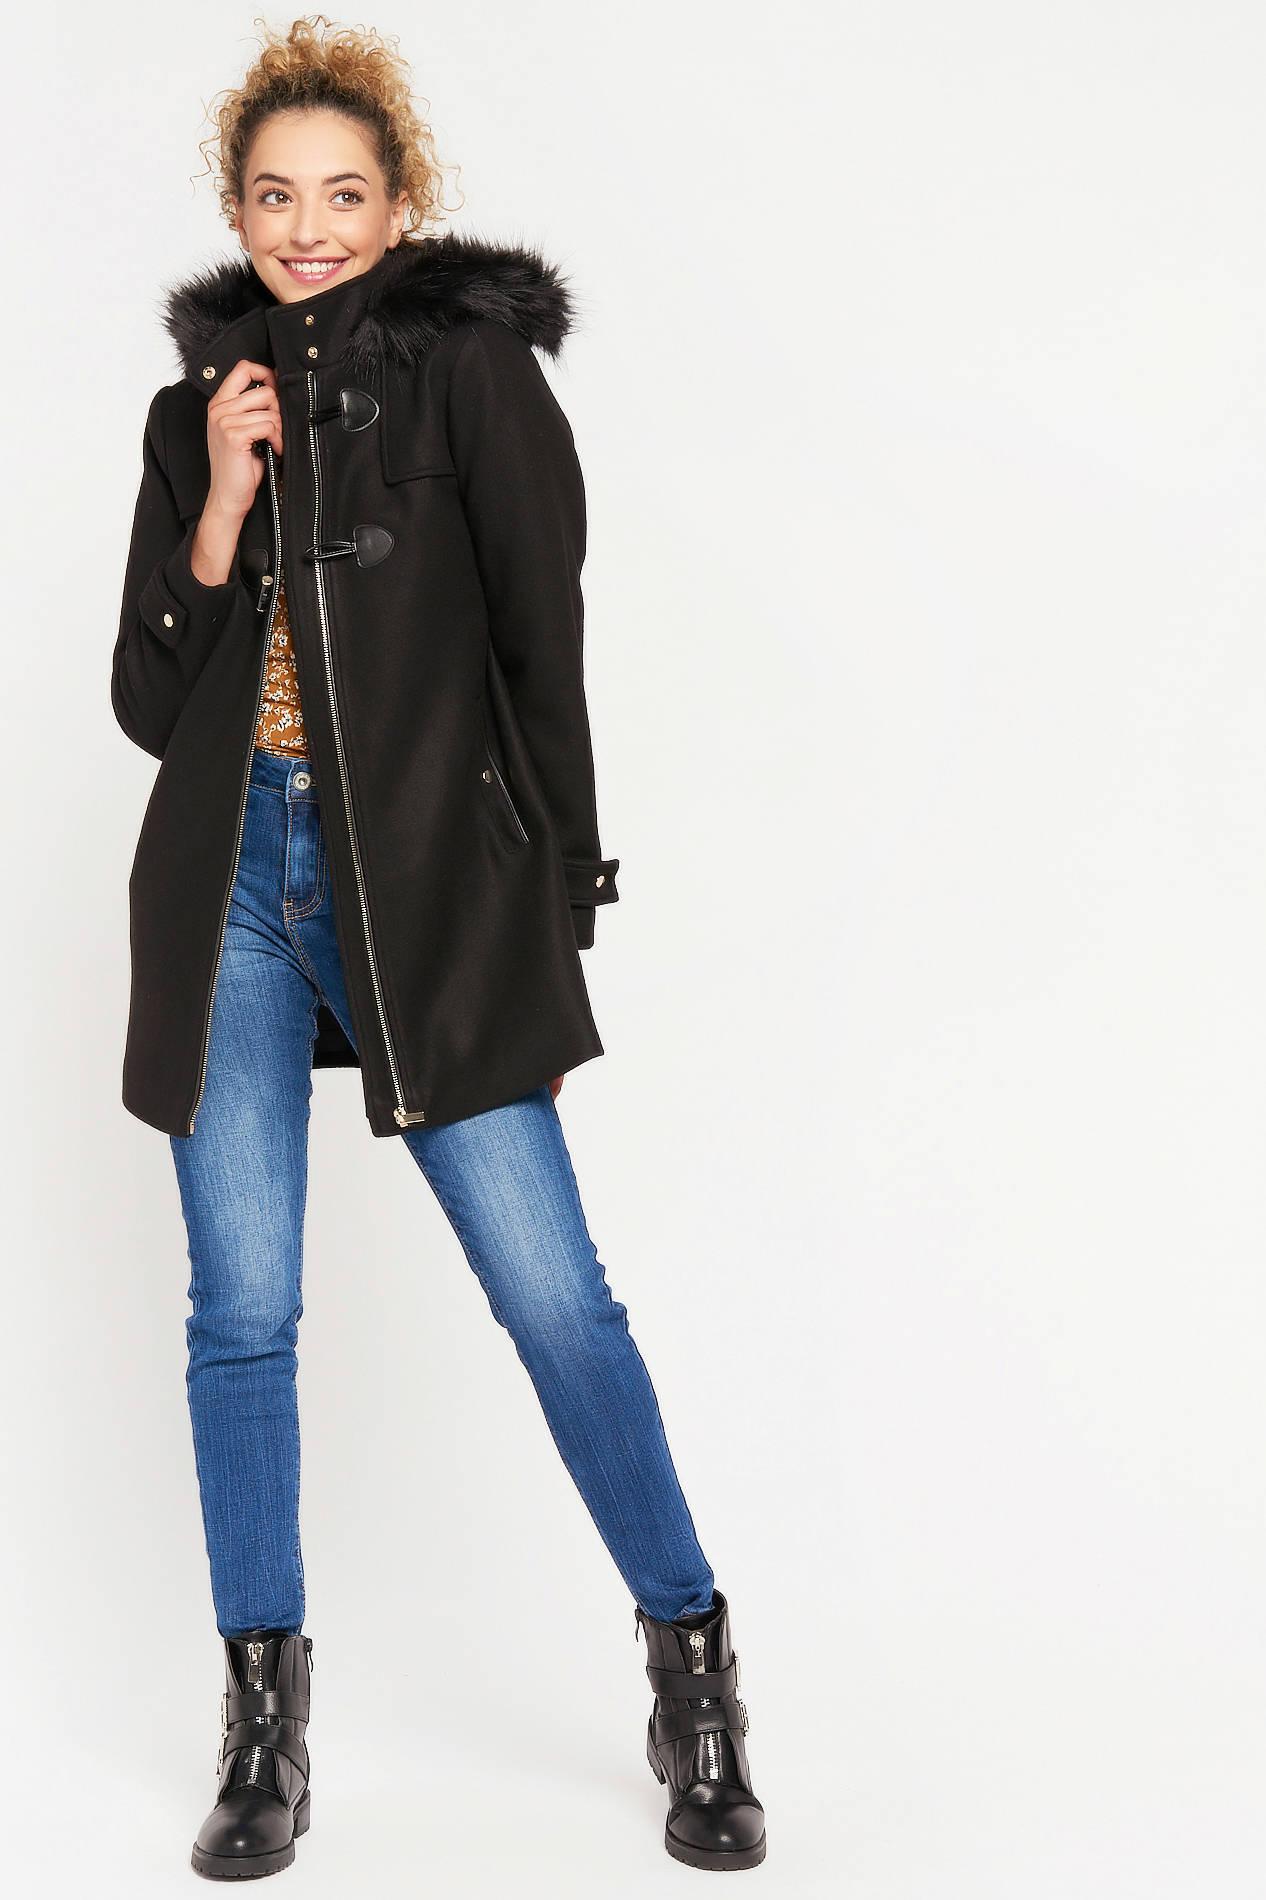 LOLALIZA jassen voor dames kopen Vind jouw LOLALIZA jassen